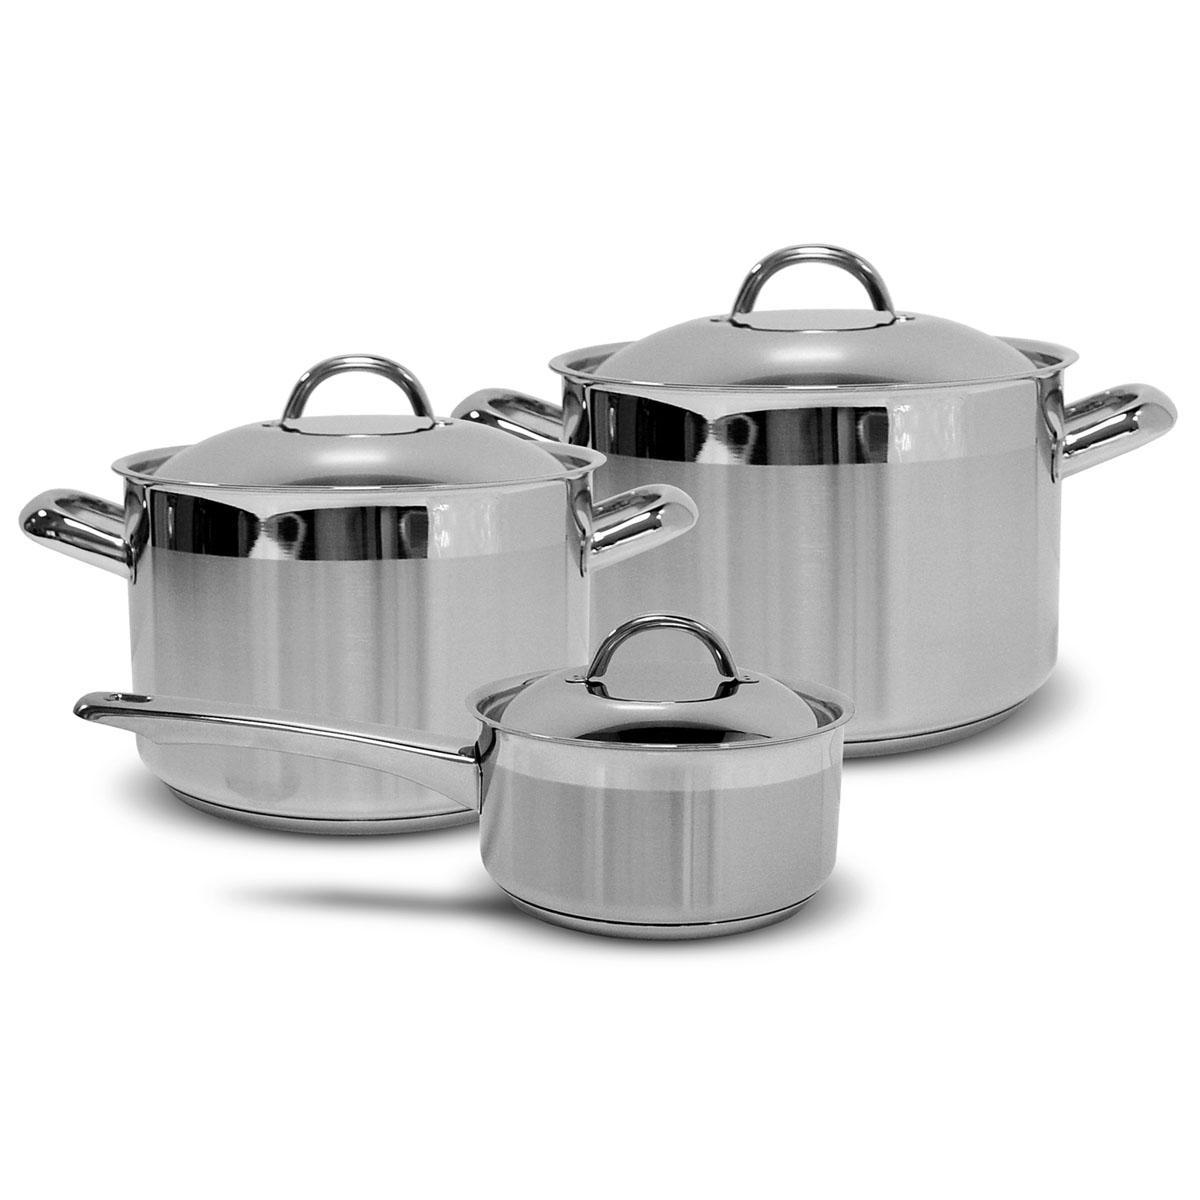 Набор посуды Silampos Европа, 6 предметов632123BM0217632123BM0217 Набор 3пр.ЕВРОПА Характеристики: Материал: сталь. Размер: 330*300*210мм. Артикул: 632123BM0217.